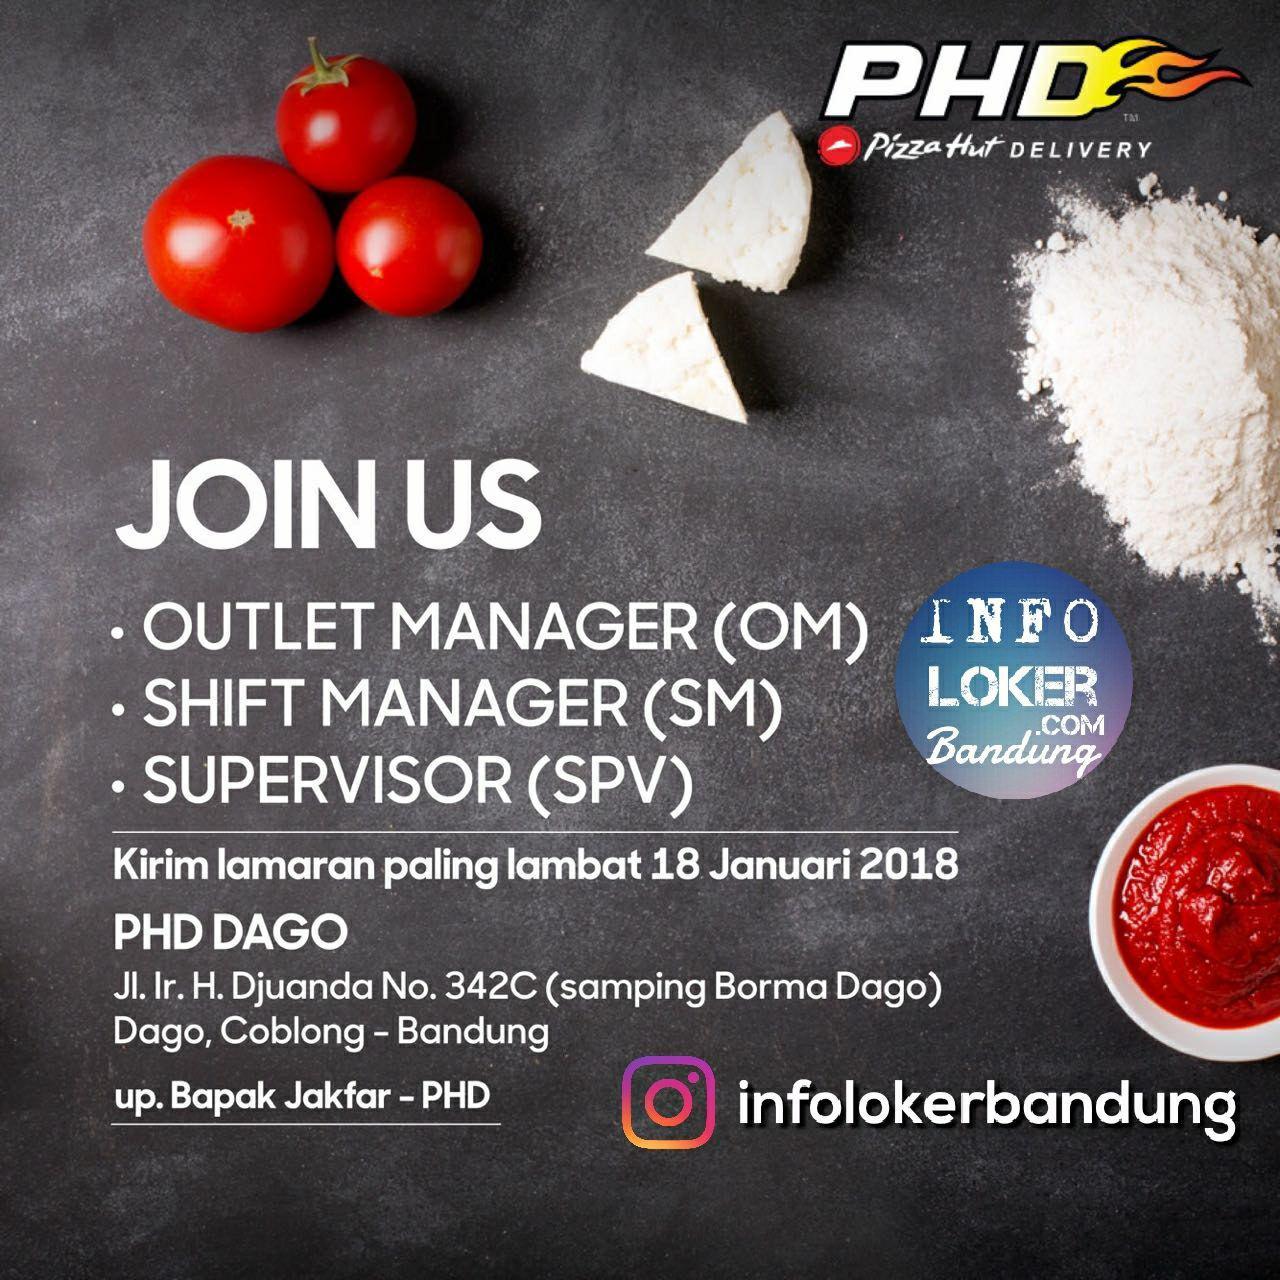 Lowongan Kerja Pizza Hut Delivery Bandung Januari 2018